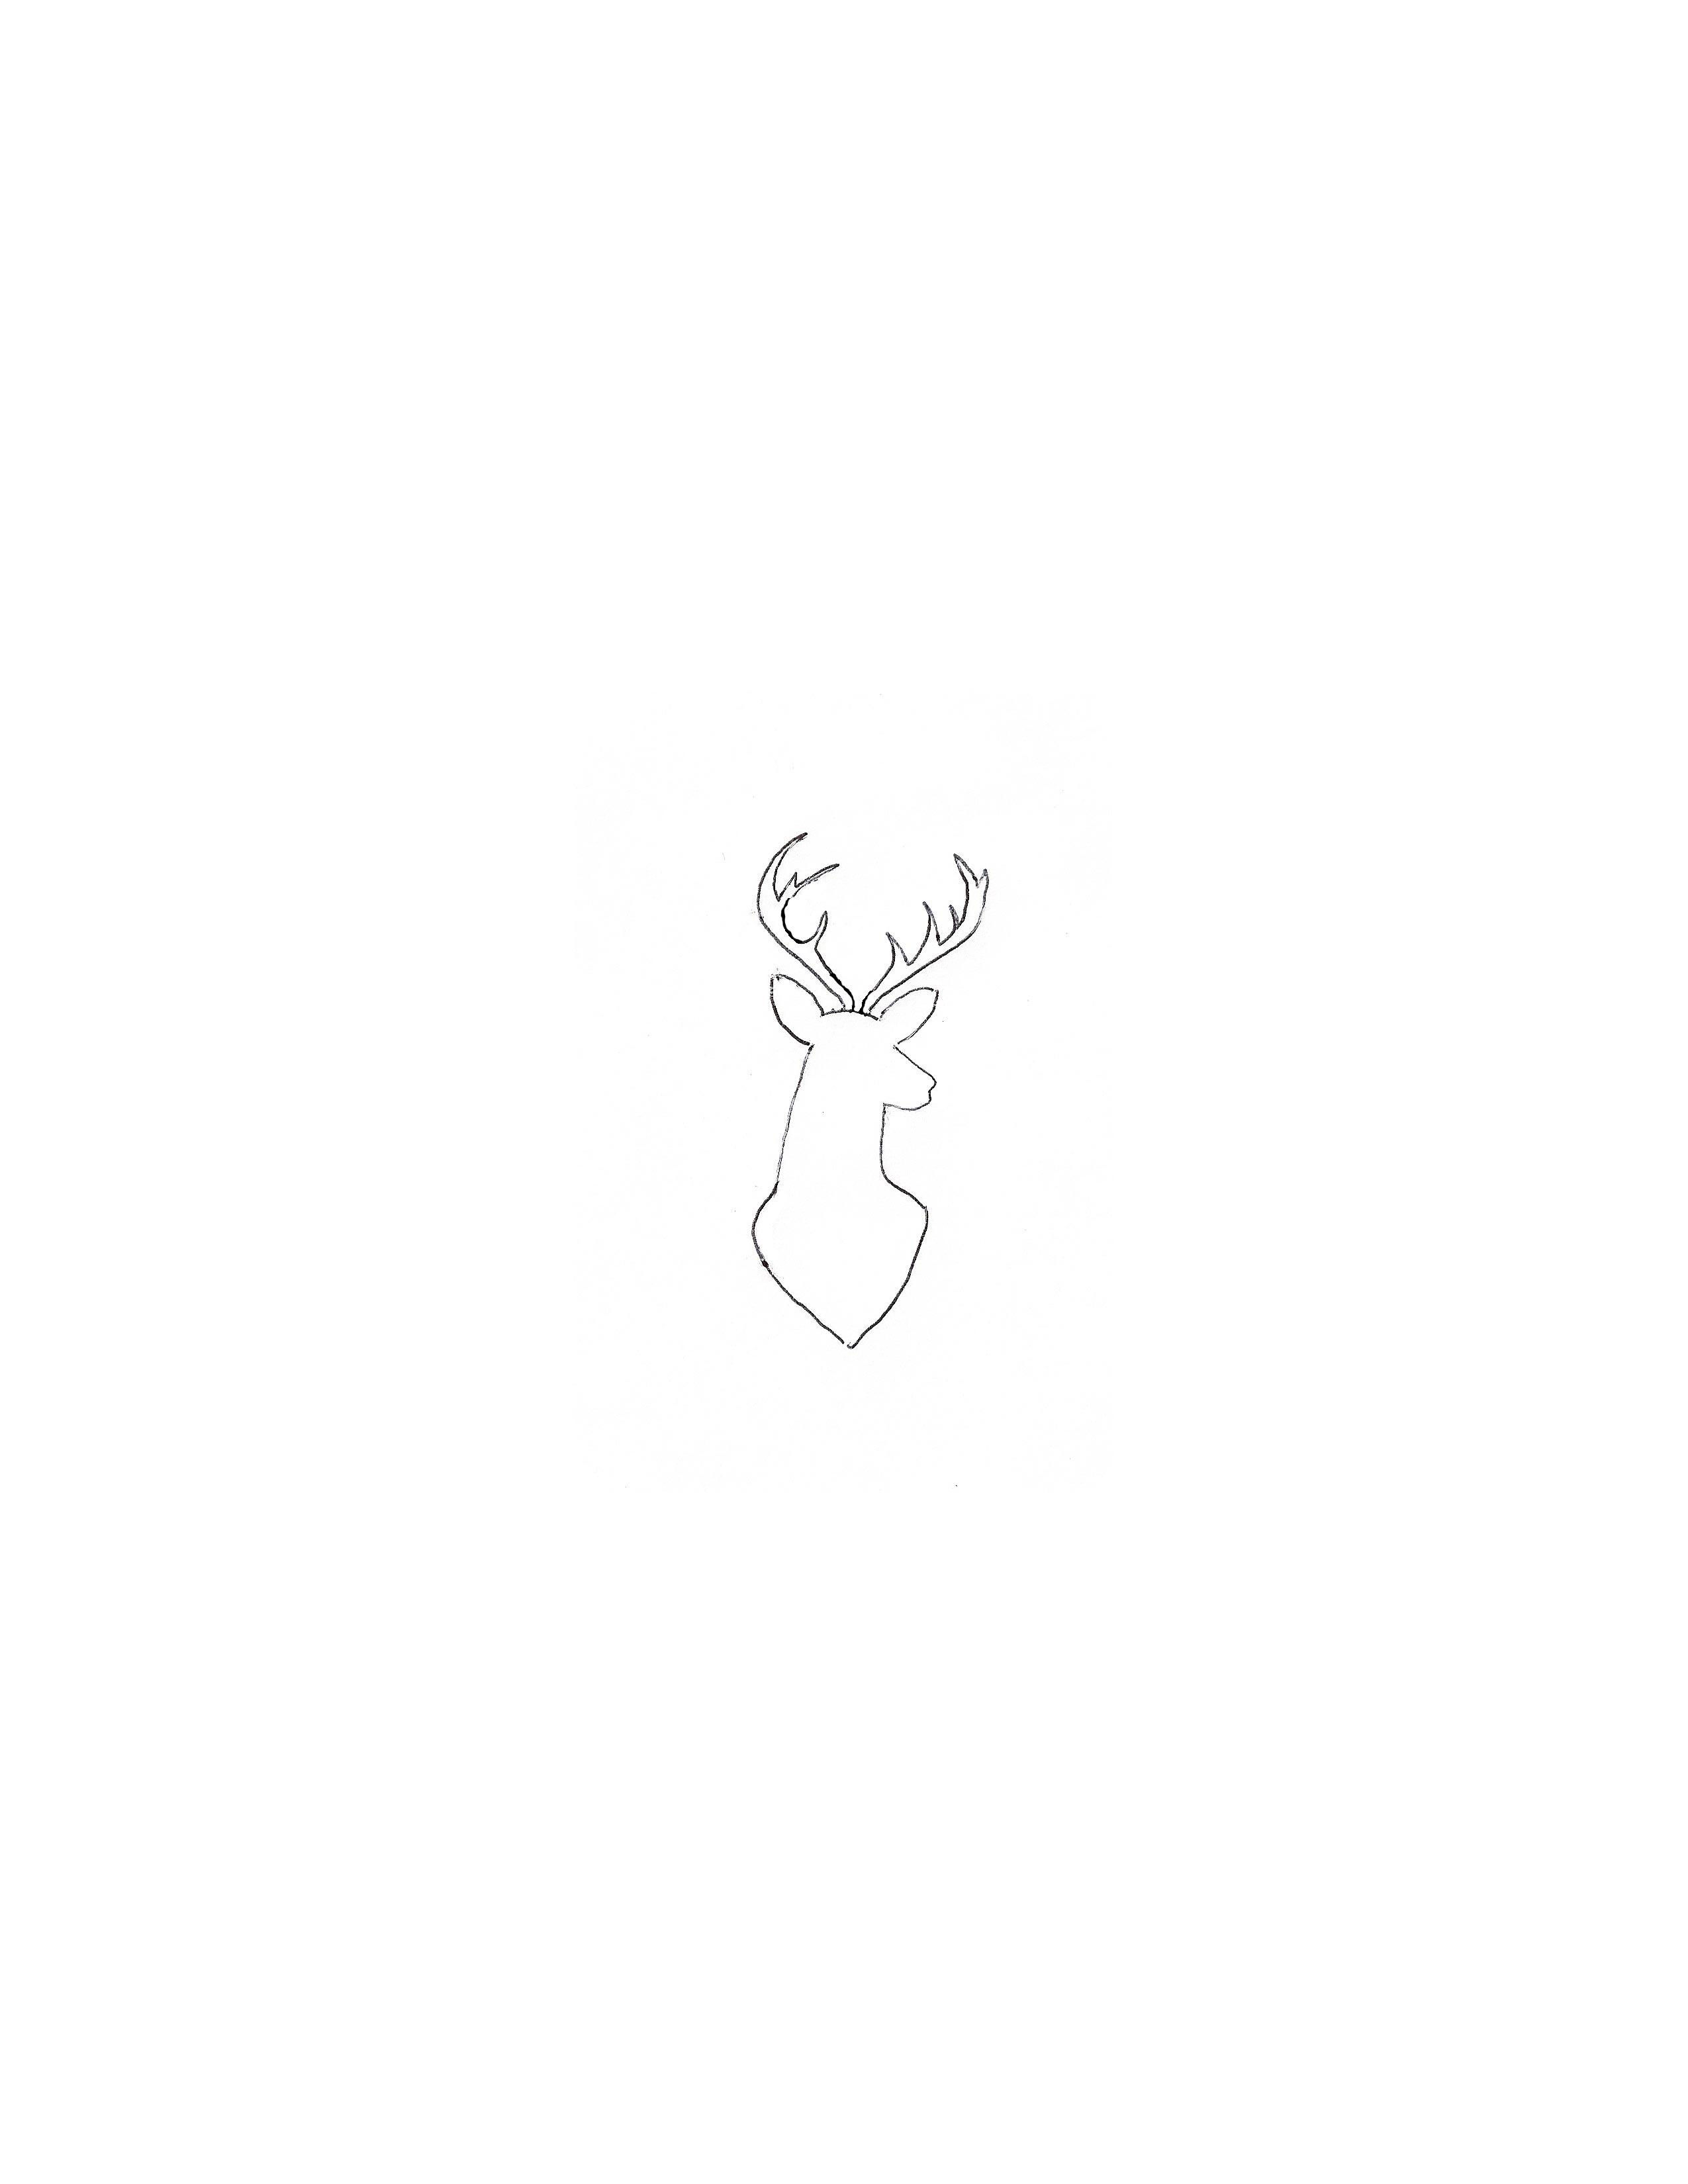 Reindeer-Template